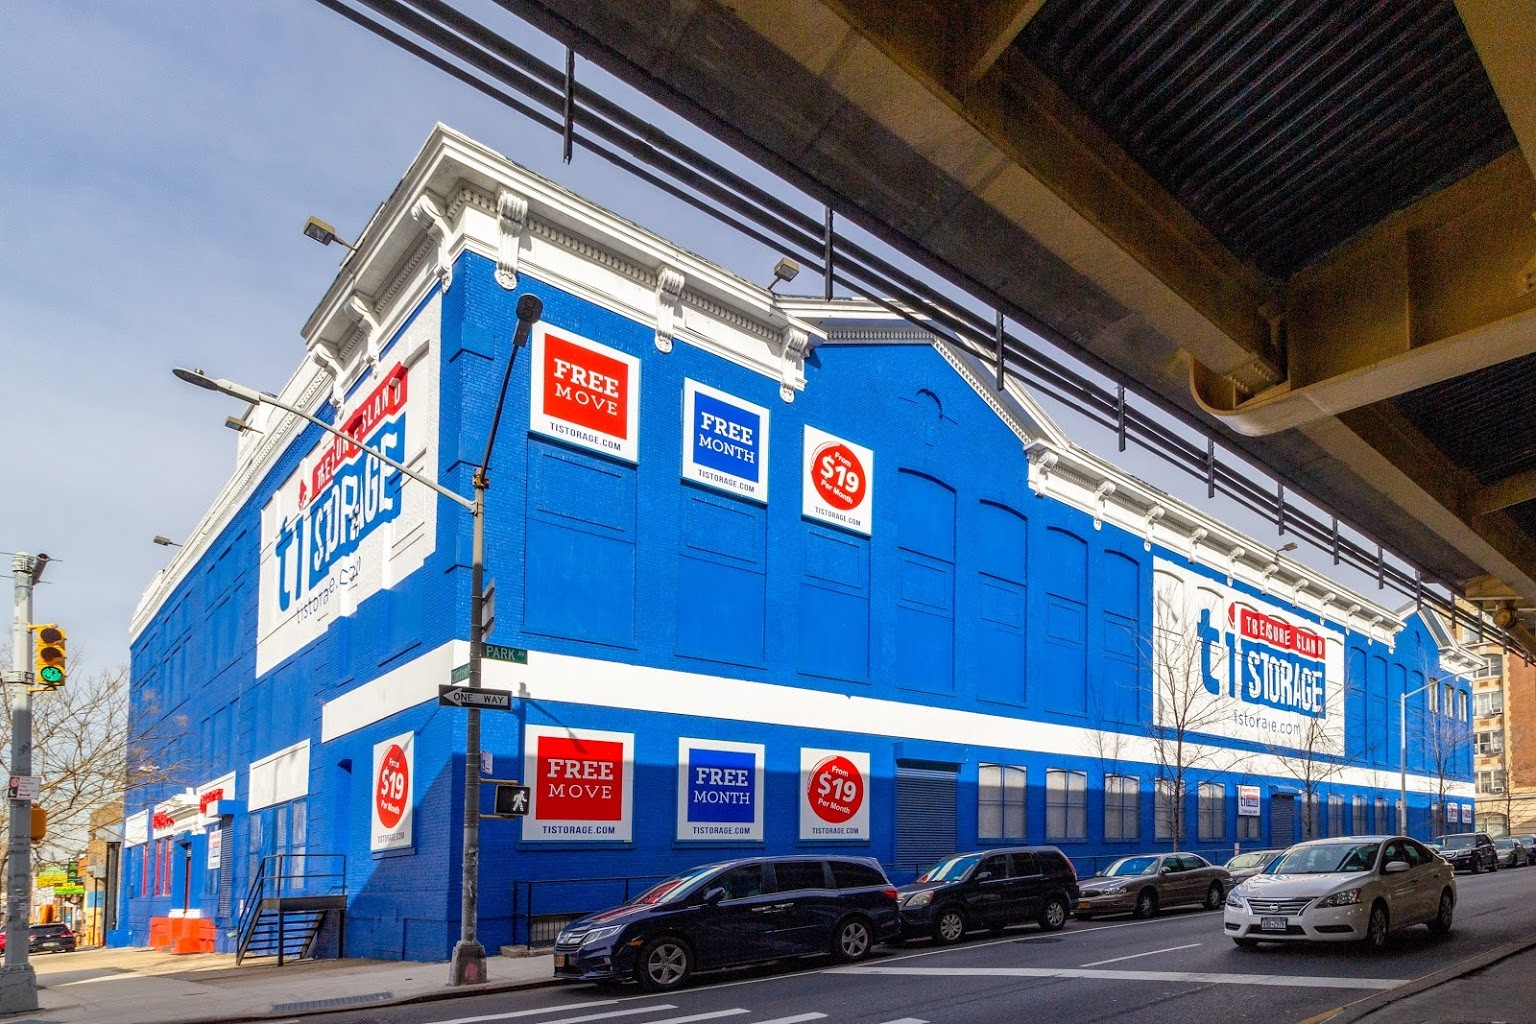 exterior building of Treasure Island Storage facility on Clinton Ave in Brooklyn, NY